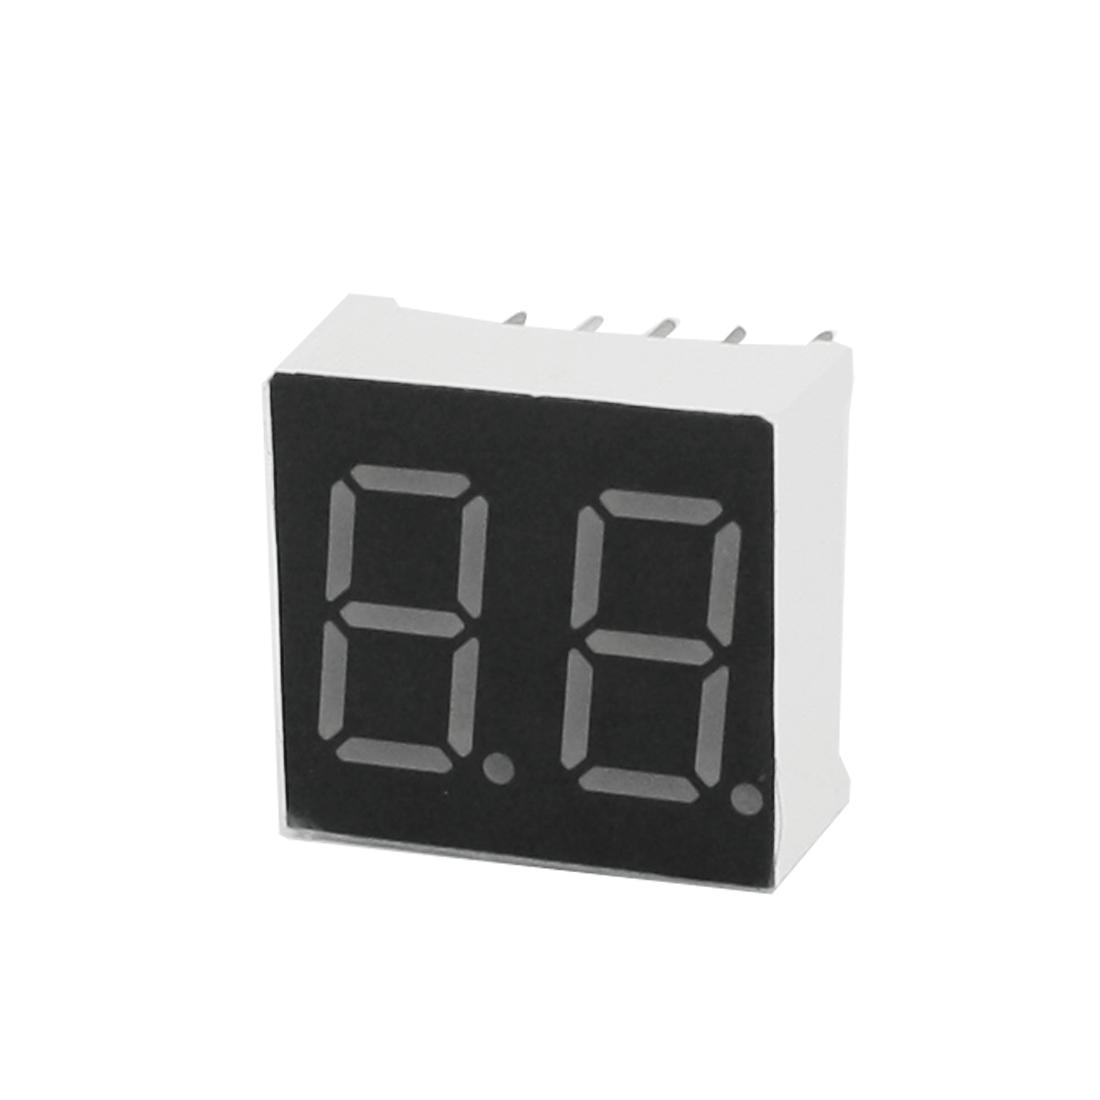 Unique Bargains DIP 10Pin 2 Bit Red LED Numeric Digital Display Common Anode 15x14mm